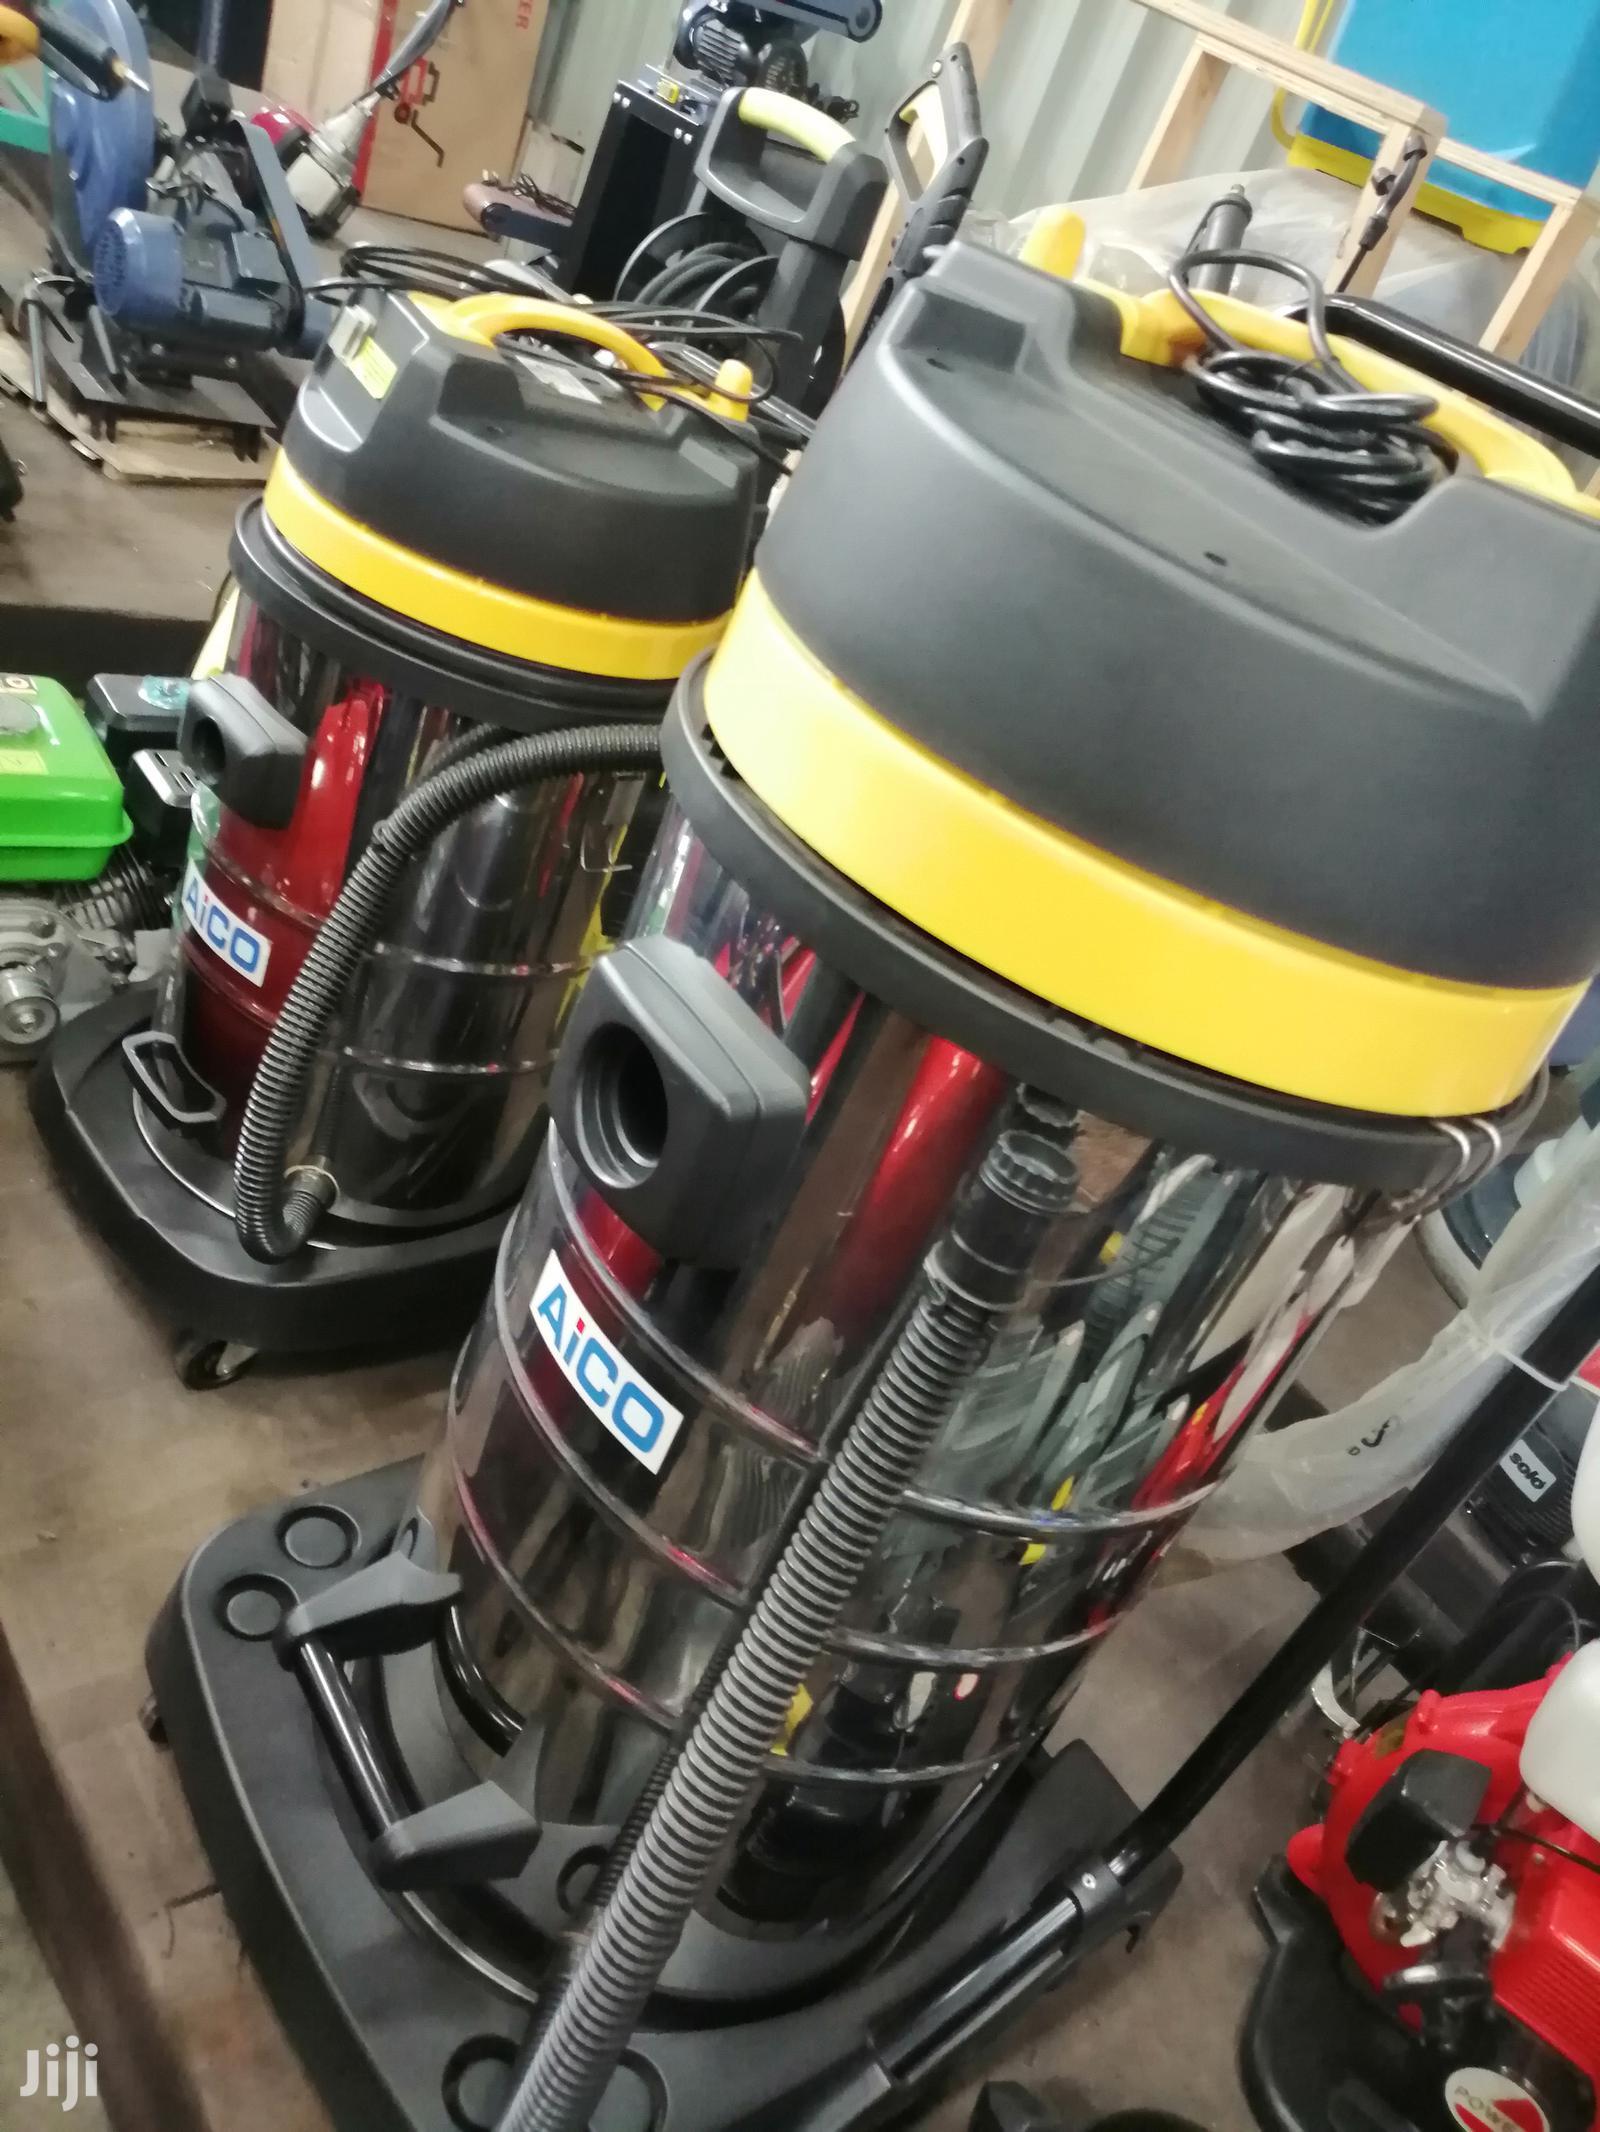 Wet And Dry Vacuum Cleaner | Home Appliances for sale in Embakasi, Nairobi, Kenya